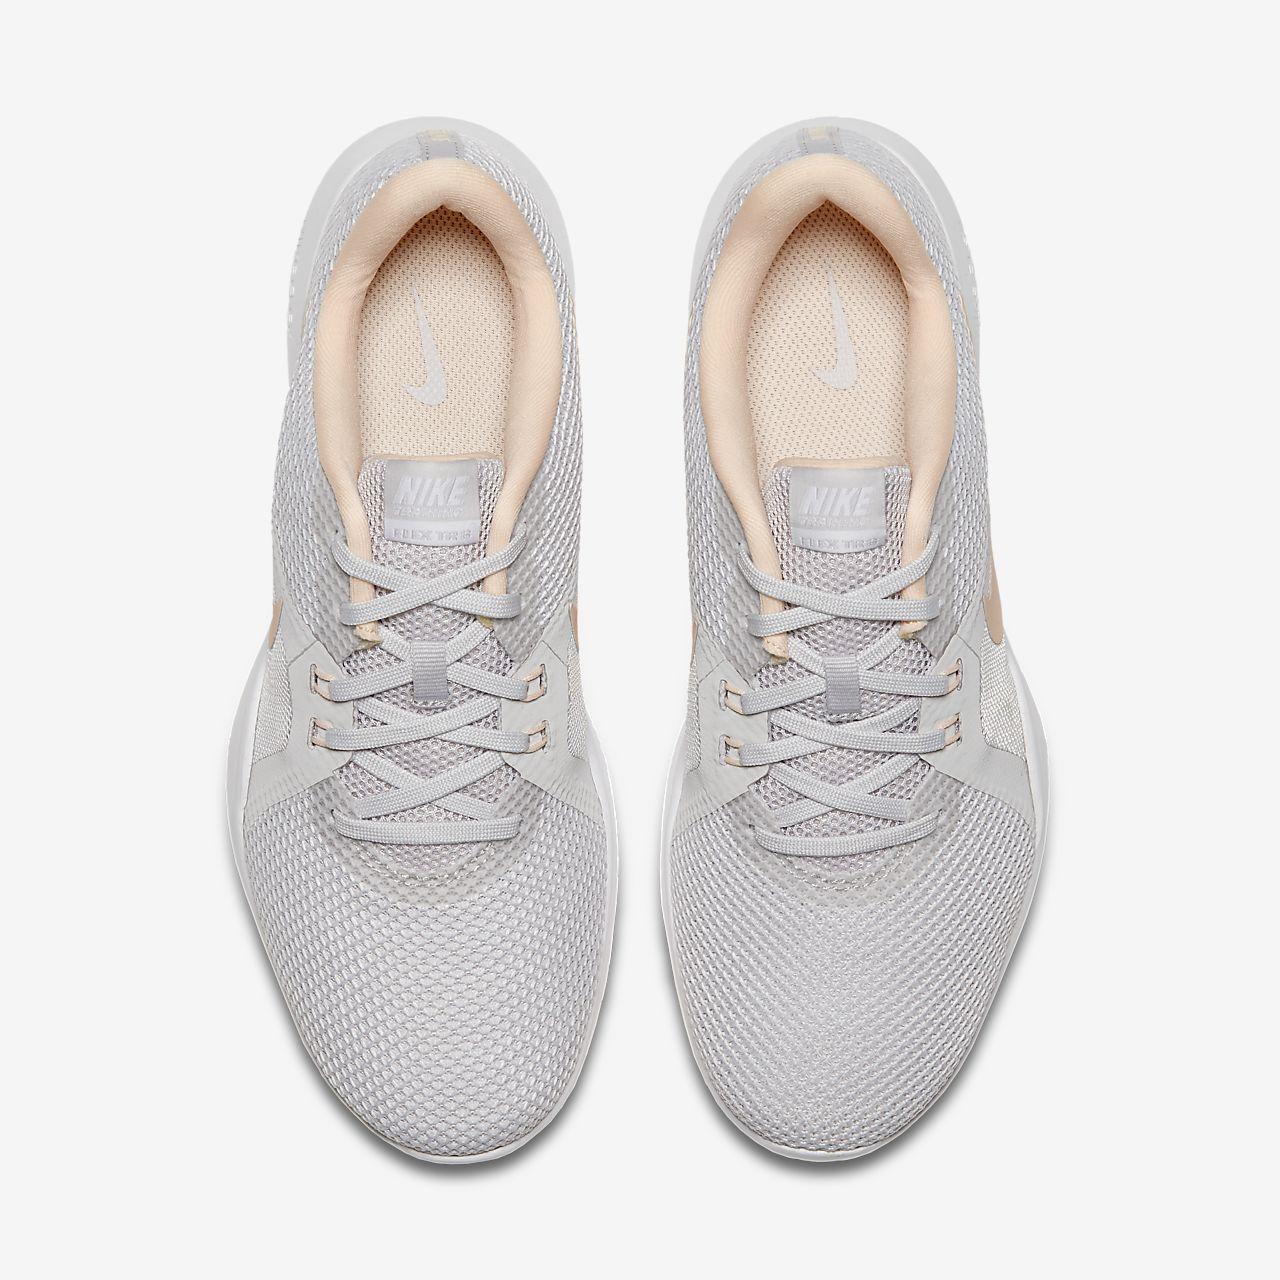 6d6728febf2 Nike Flex TR8 Women s Training Shoe. Nike.com GB